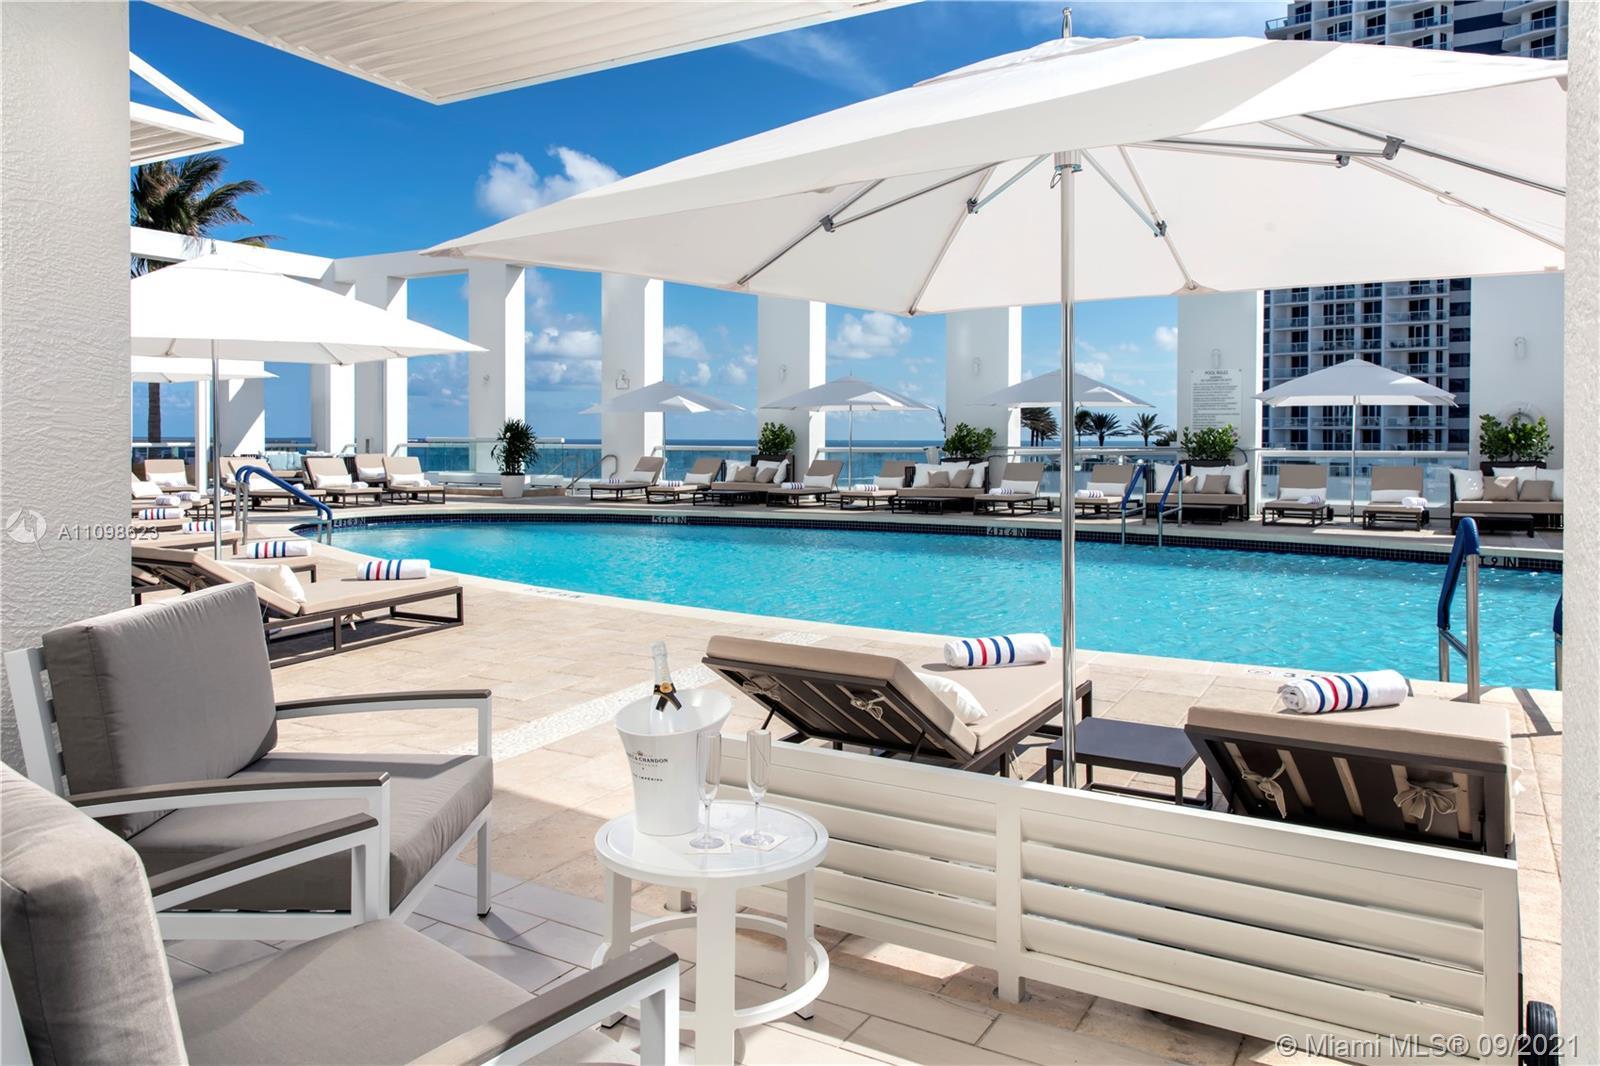 551 N Fort Lauderdale Beach Blvd #12